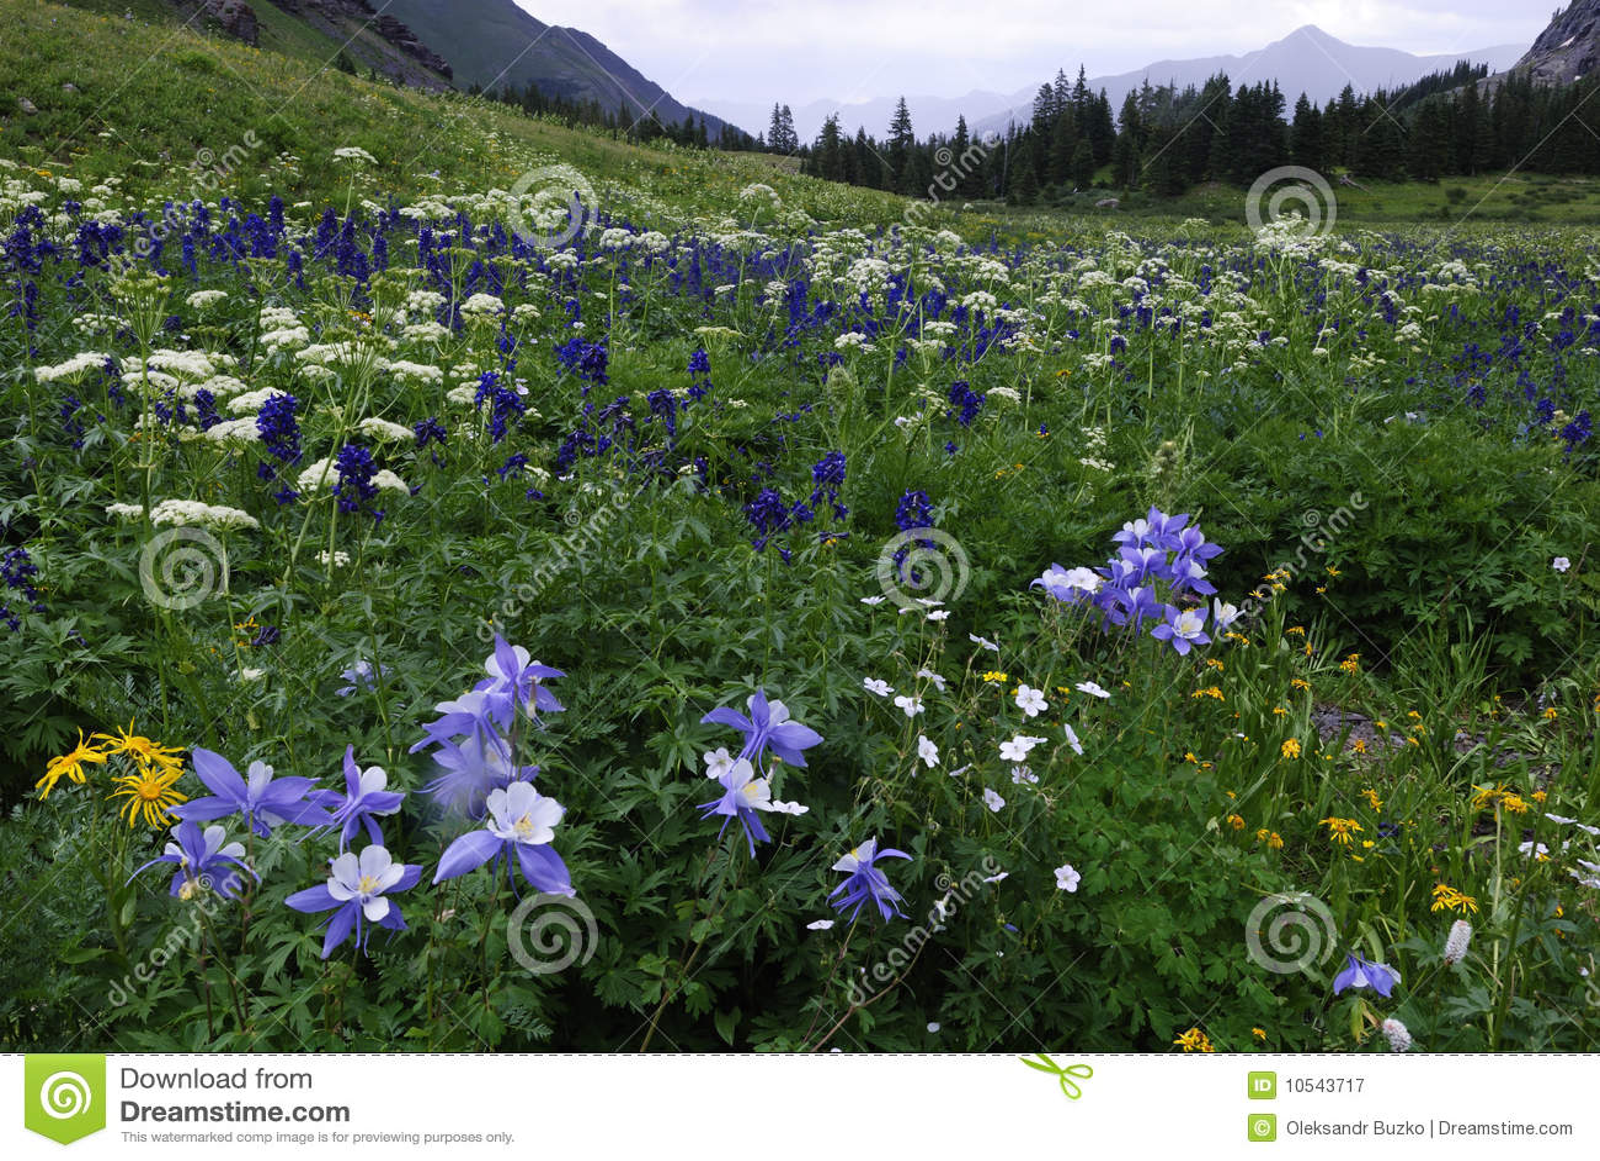 Wildflowers in San Juan Mountains in Colorado